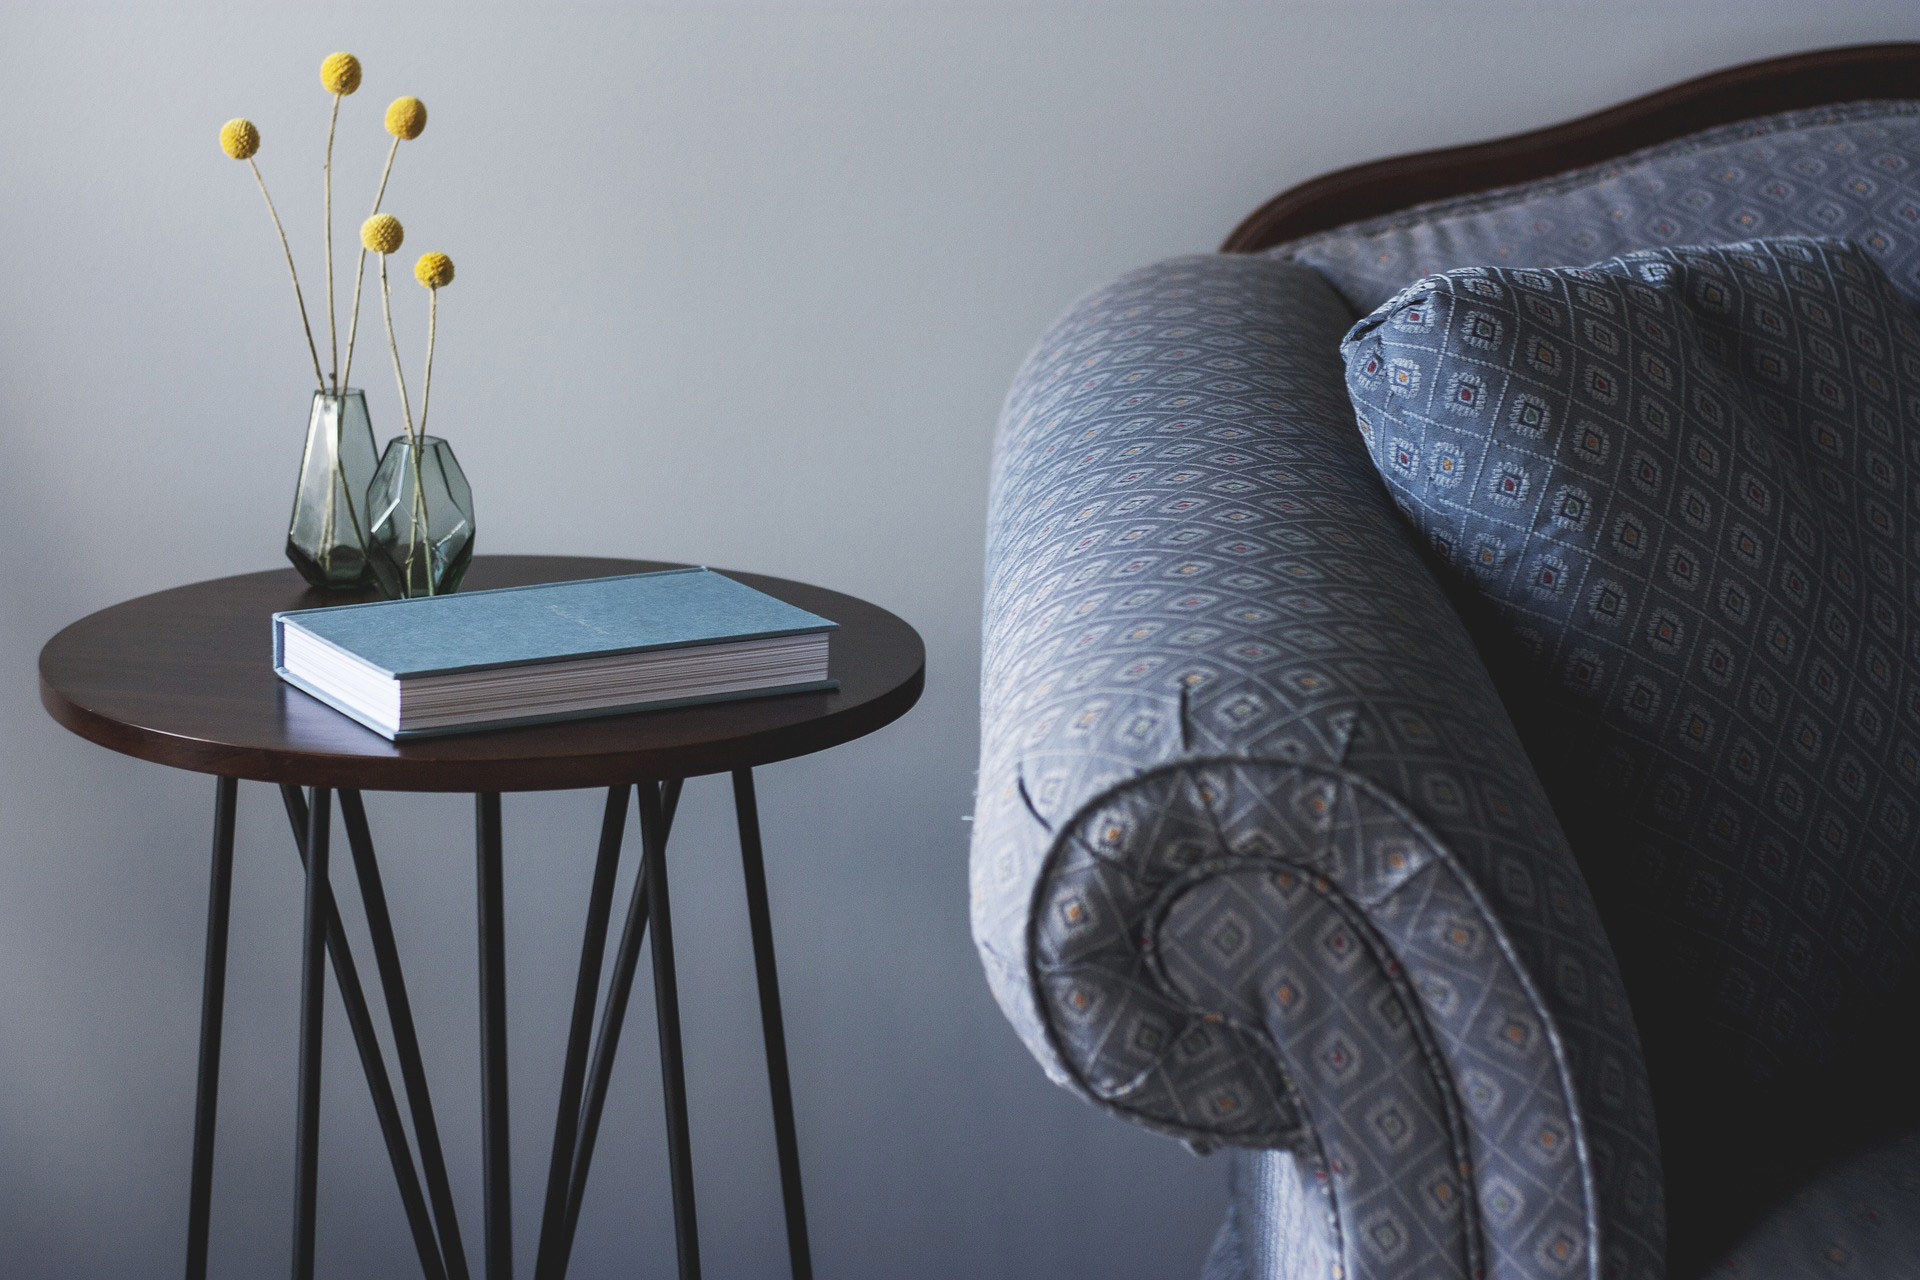 Polstermöbel Material - Textil